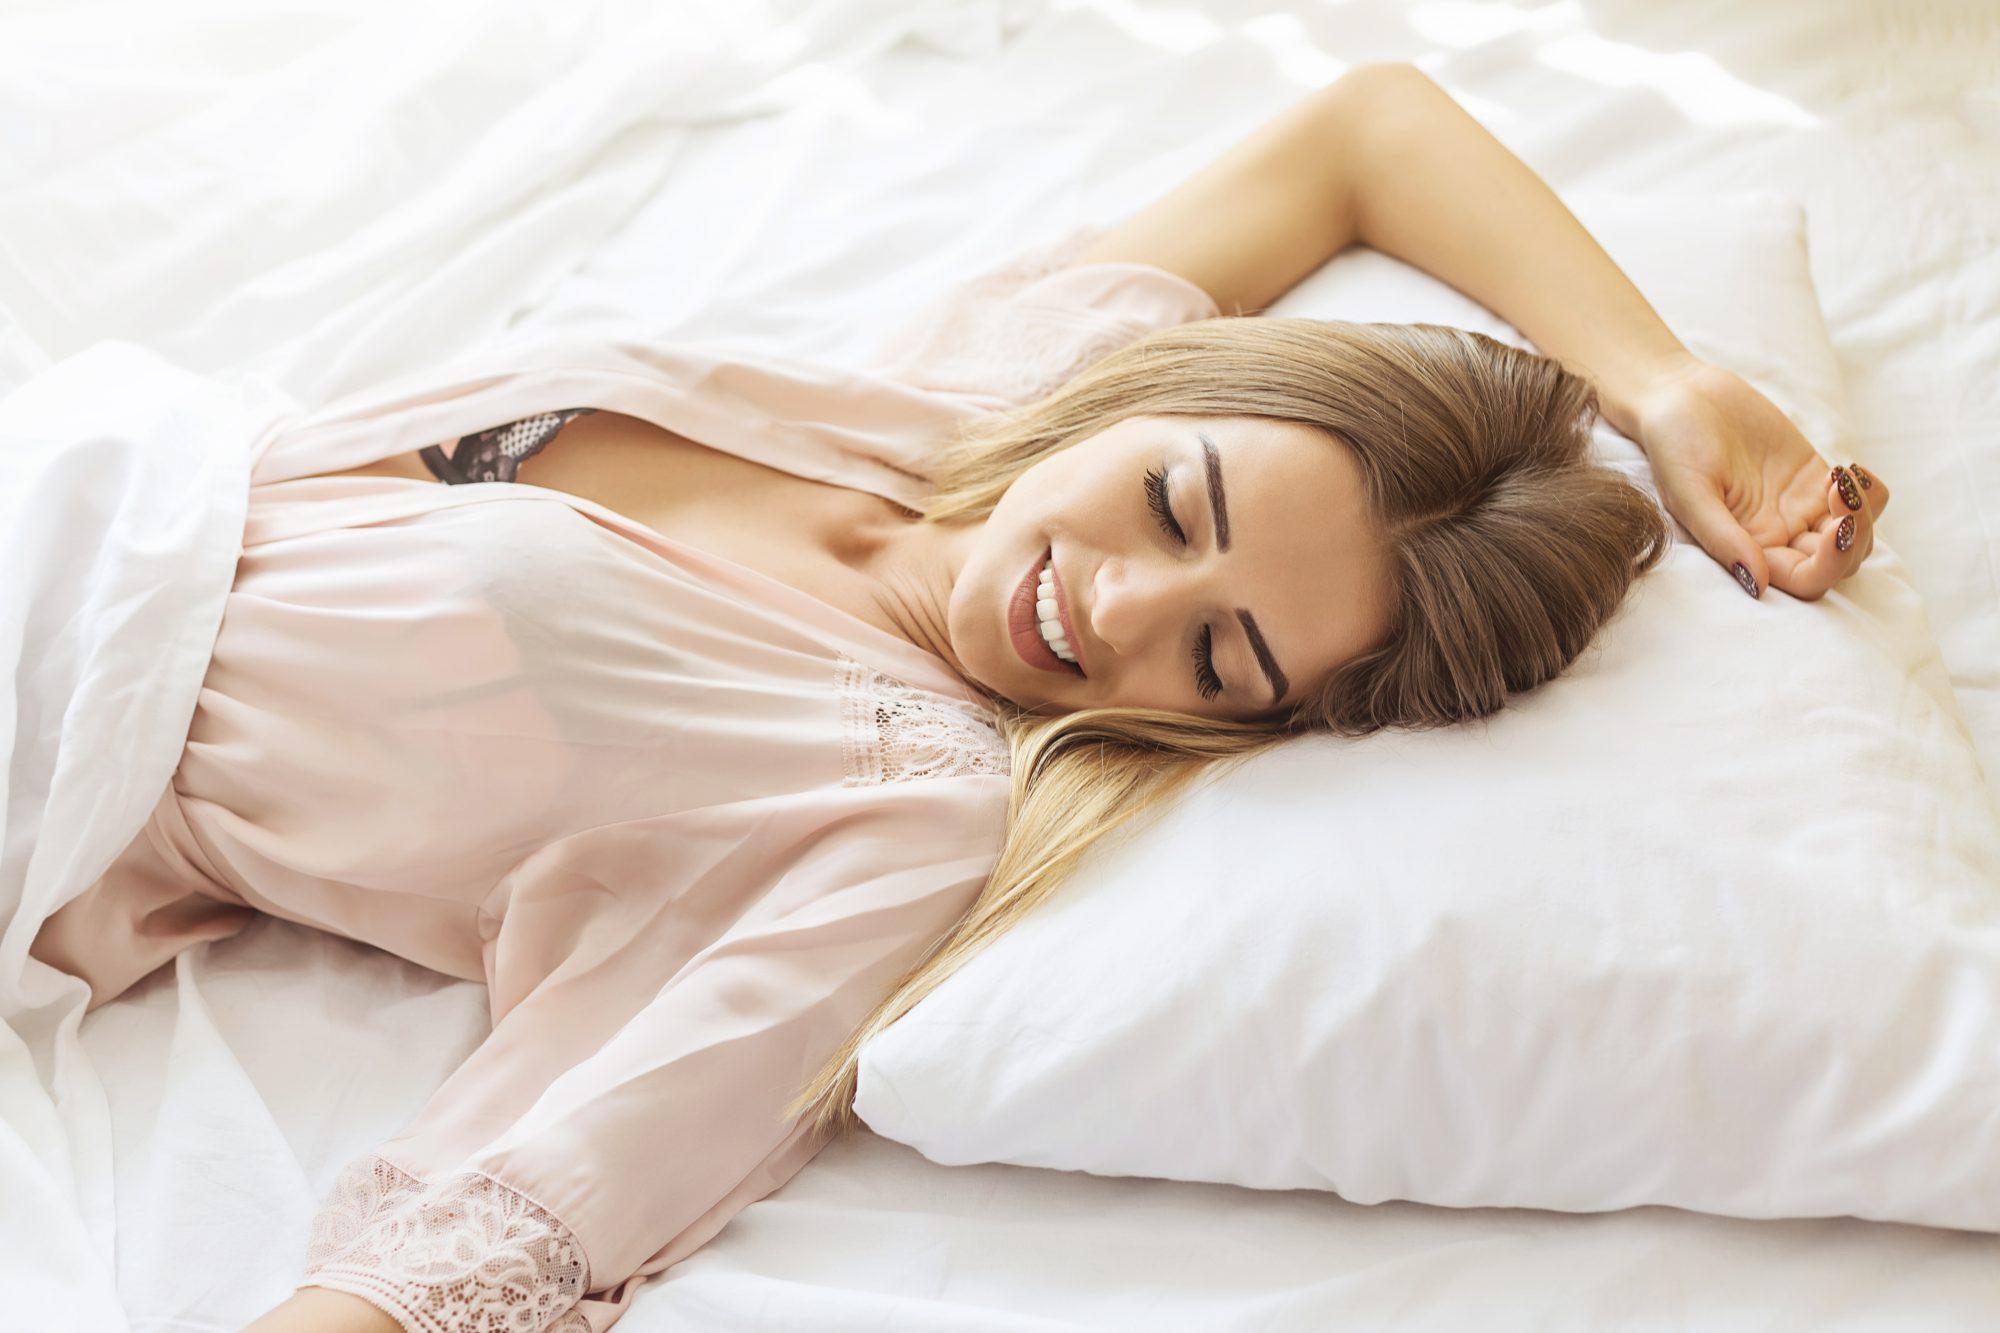 Womanizer Pro 40 Clitoral Vibrator Clit Massaging Vibrating, Amazon Prime